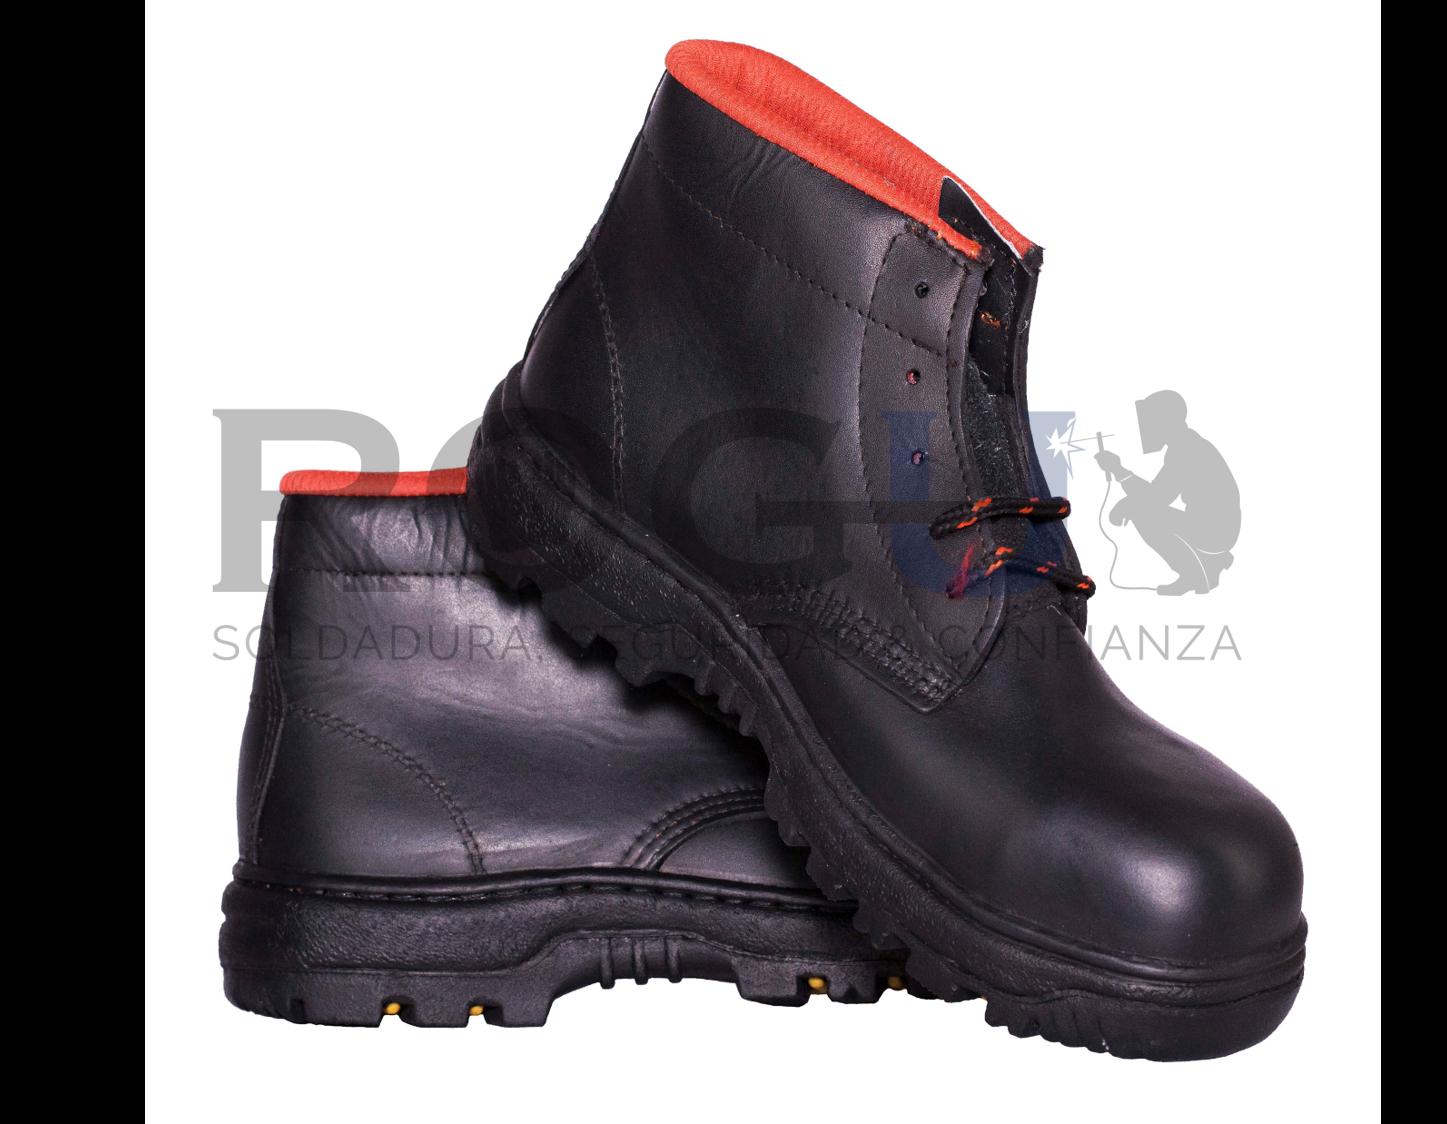 f219ac5a Botas Industriales Borcegui Modelo 1 negro ROGU México